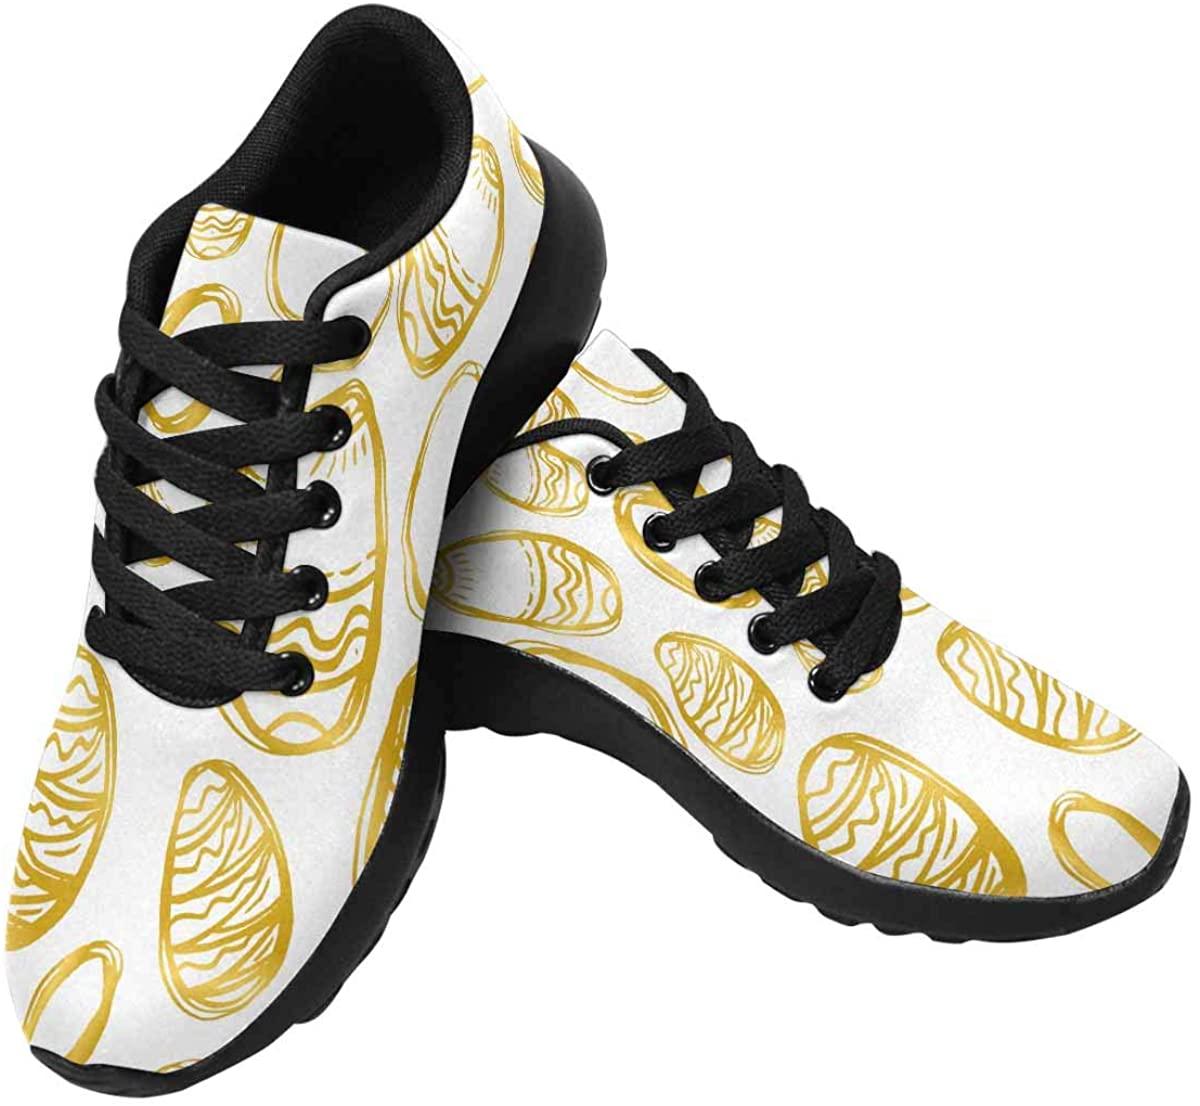 INTERESTPRINT Golden Easter Eggs and Specks Womens Jogging Sneakers Outdoor Sport Cross Training Shoes